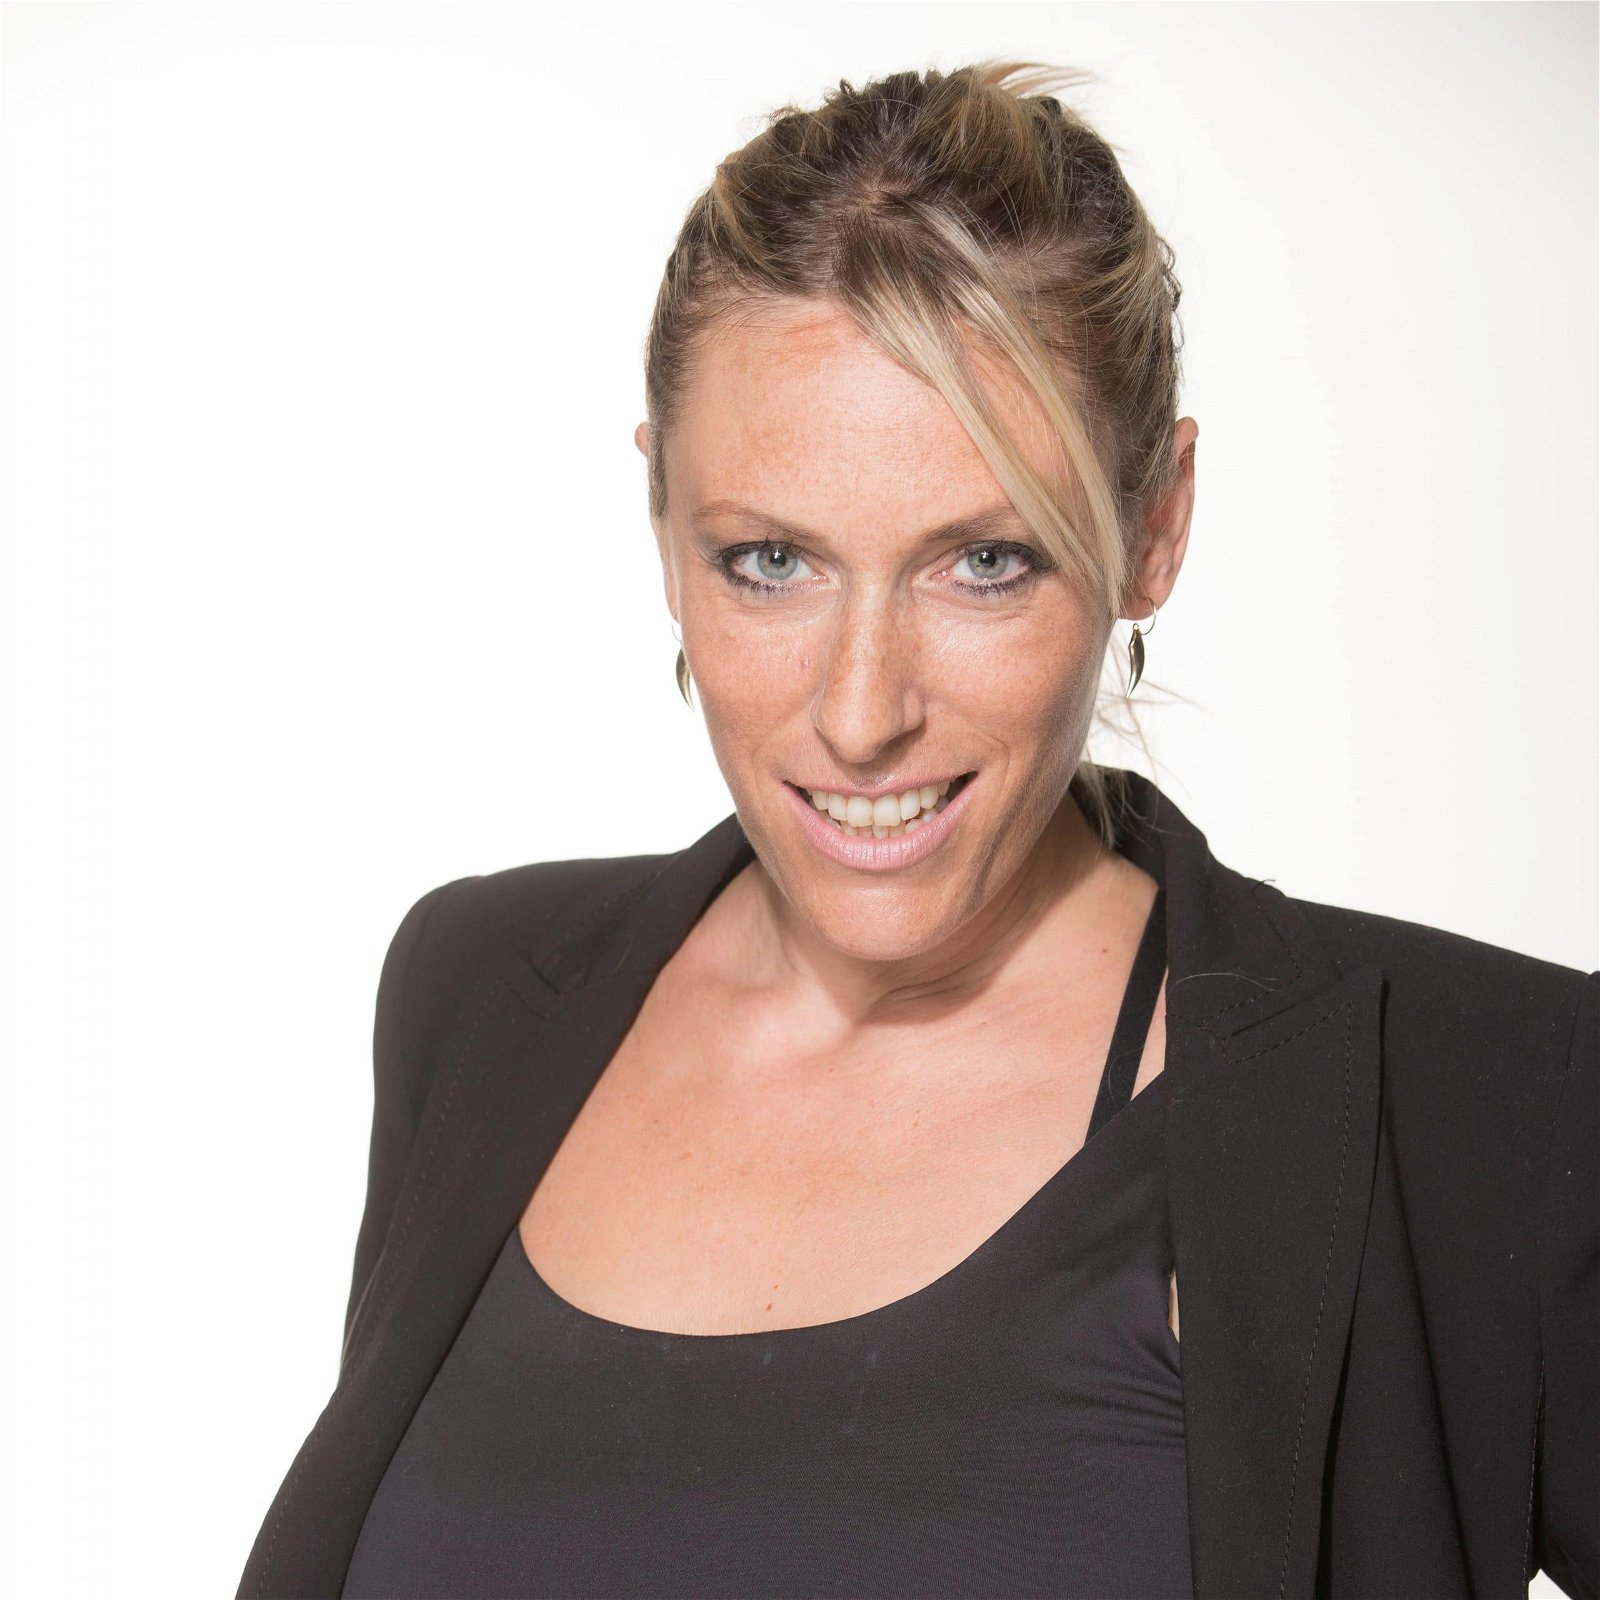 kate-l-british-voiceover-artist-and-presenter